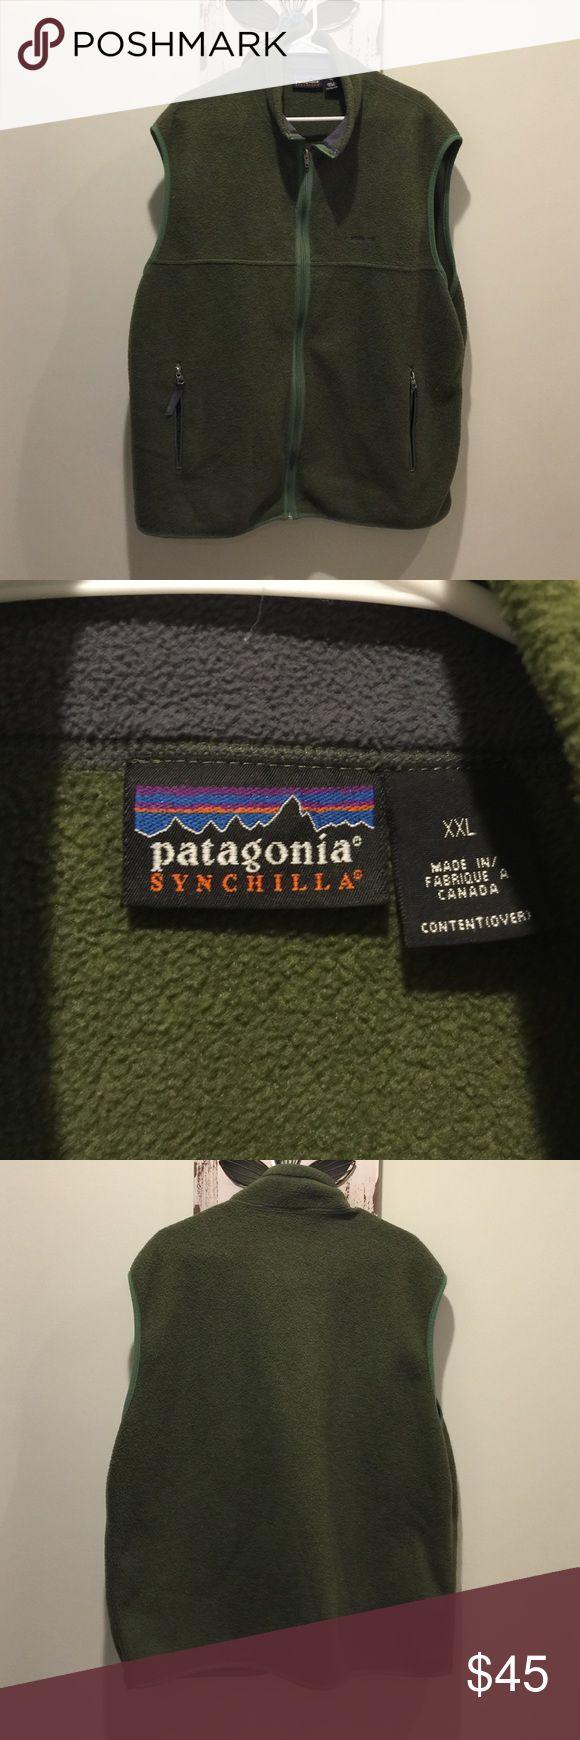 Men's Patagonia Synchilla Green Fleece Vest 2XL Men's Patagonia Fleece Full Zip Synchilla Green Vest.  EUC.  Size XXL 2XL. Patagonia Jackets & Coats Vests